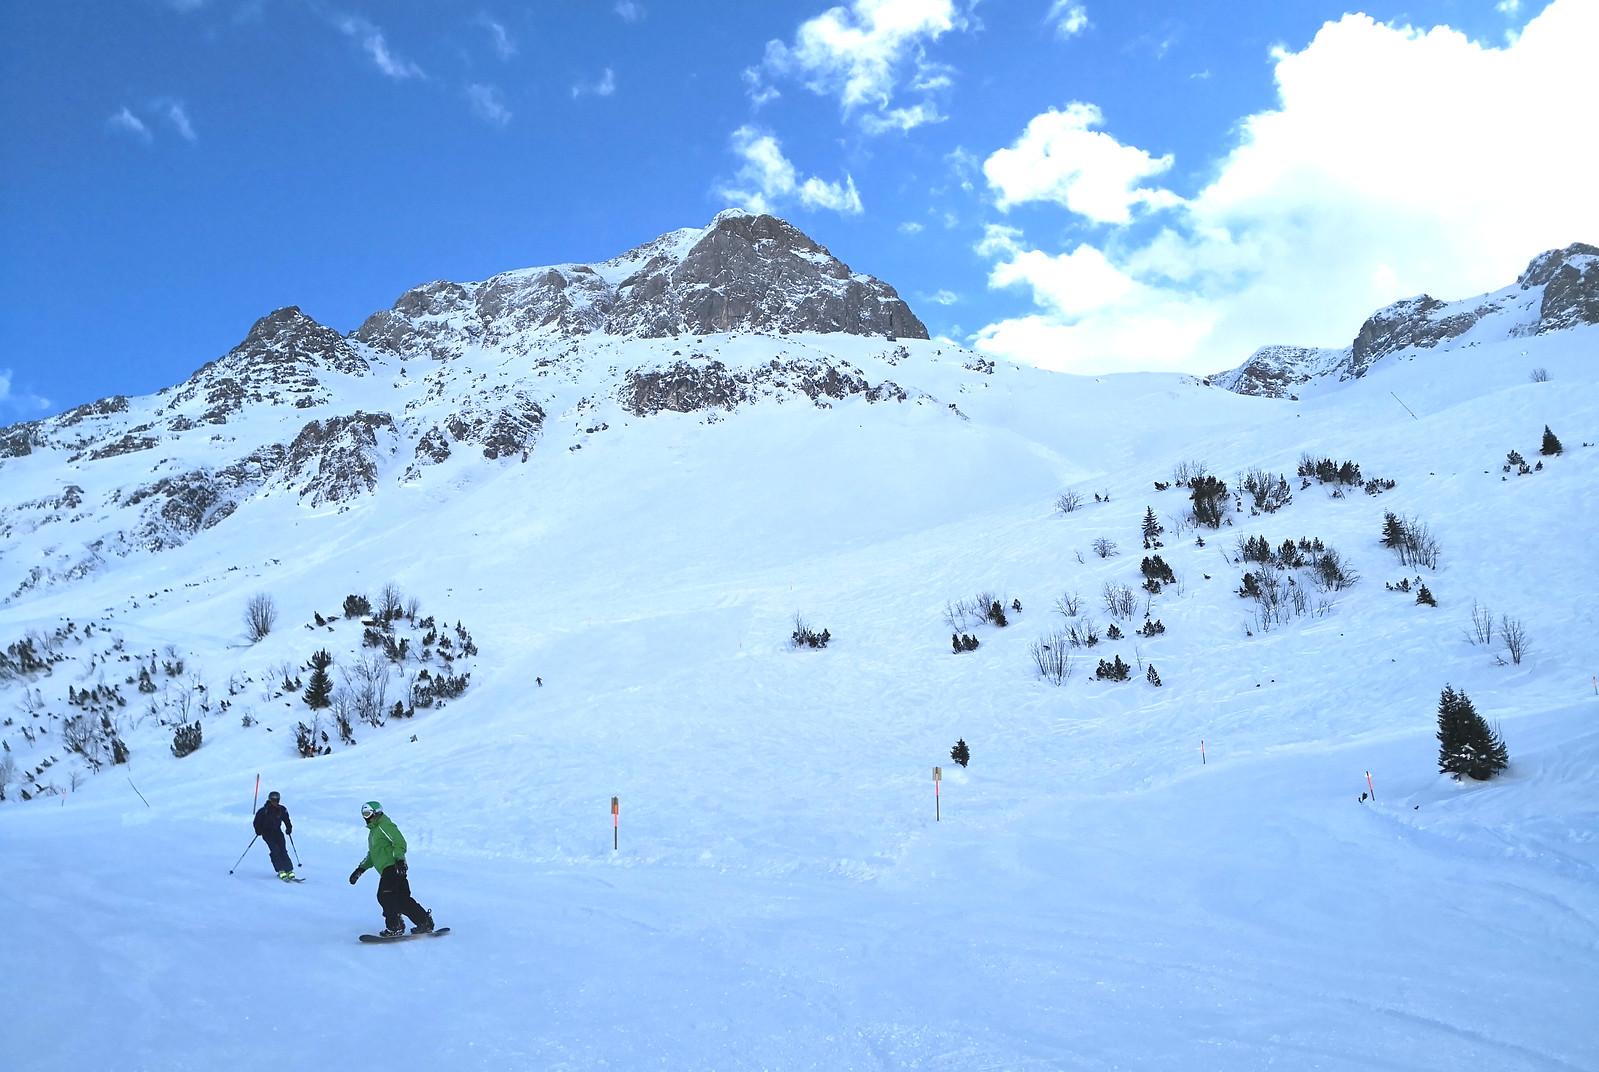 Madloch-Zug ski route